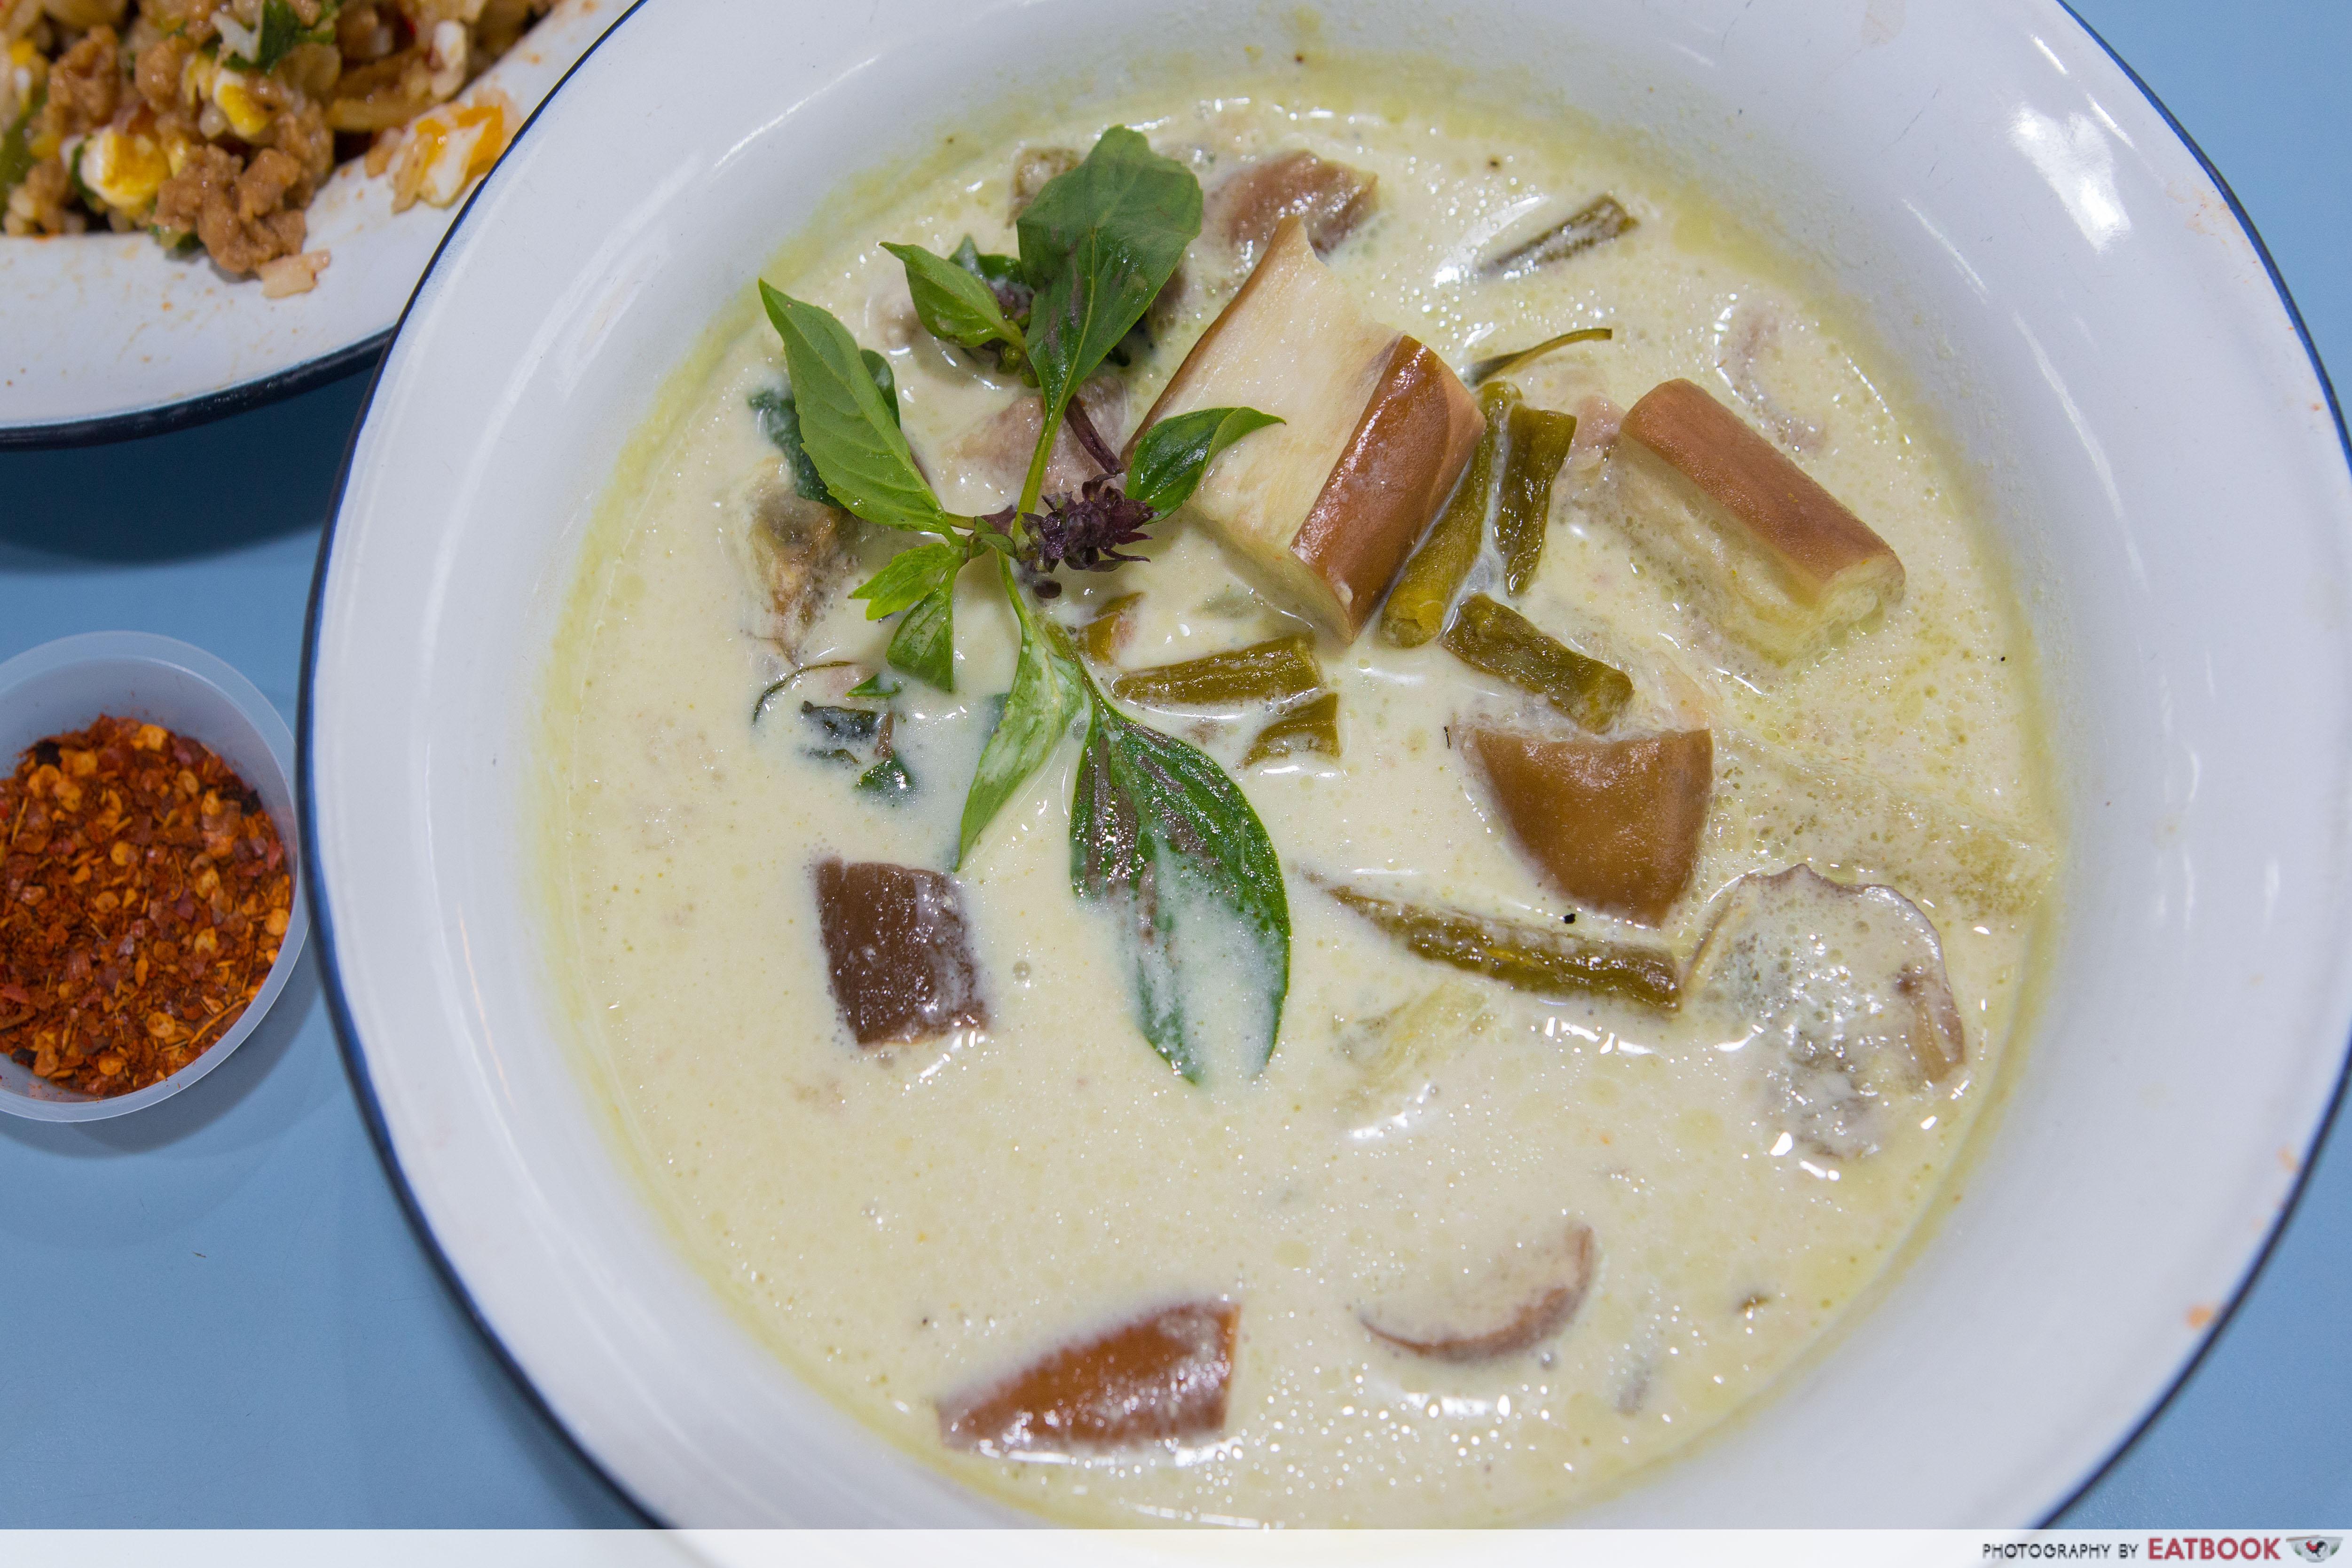 Basil & Mint - Green Curry